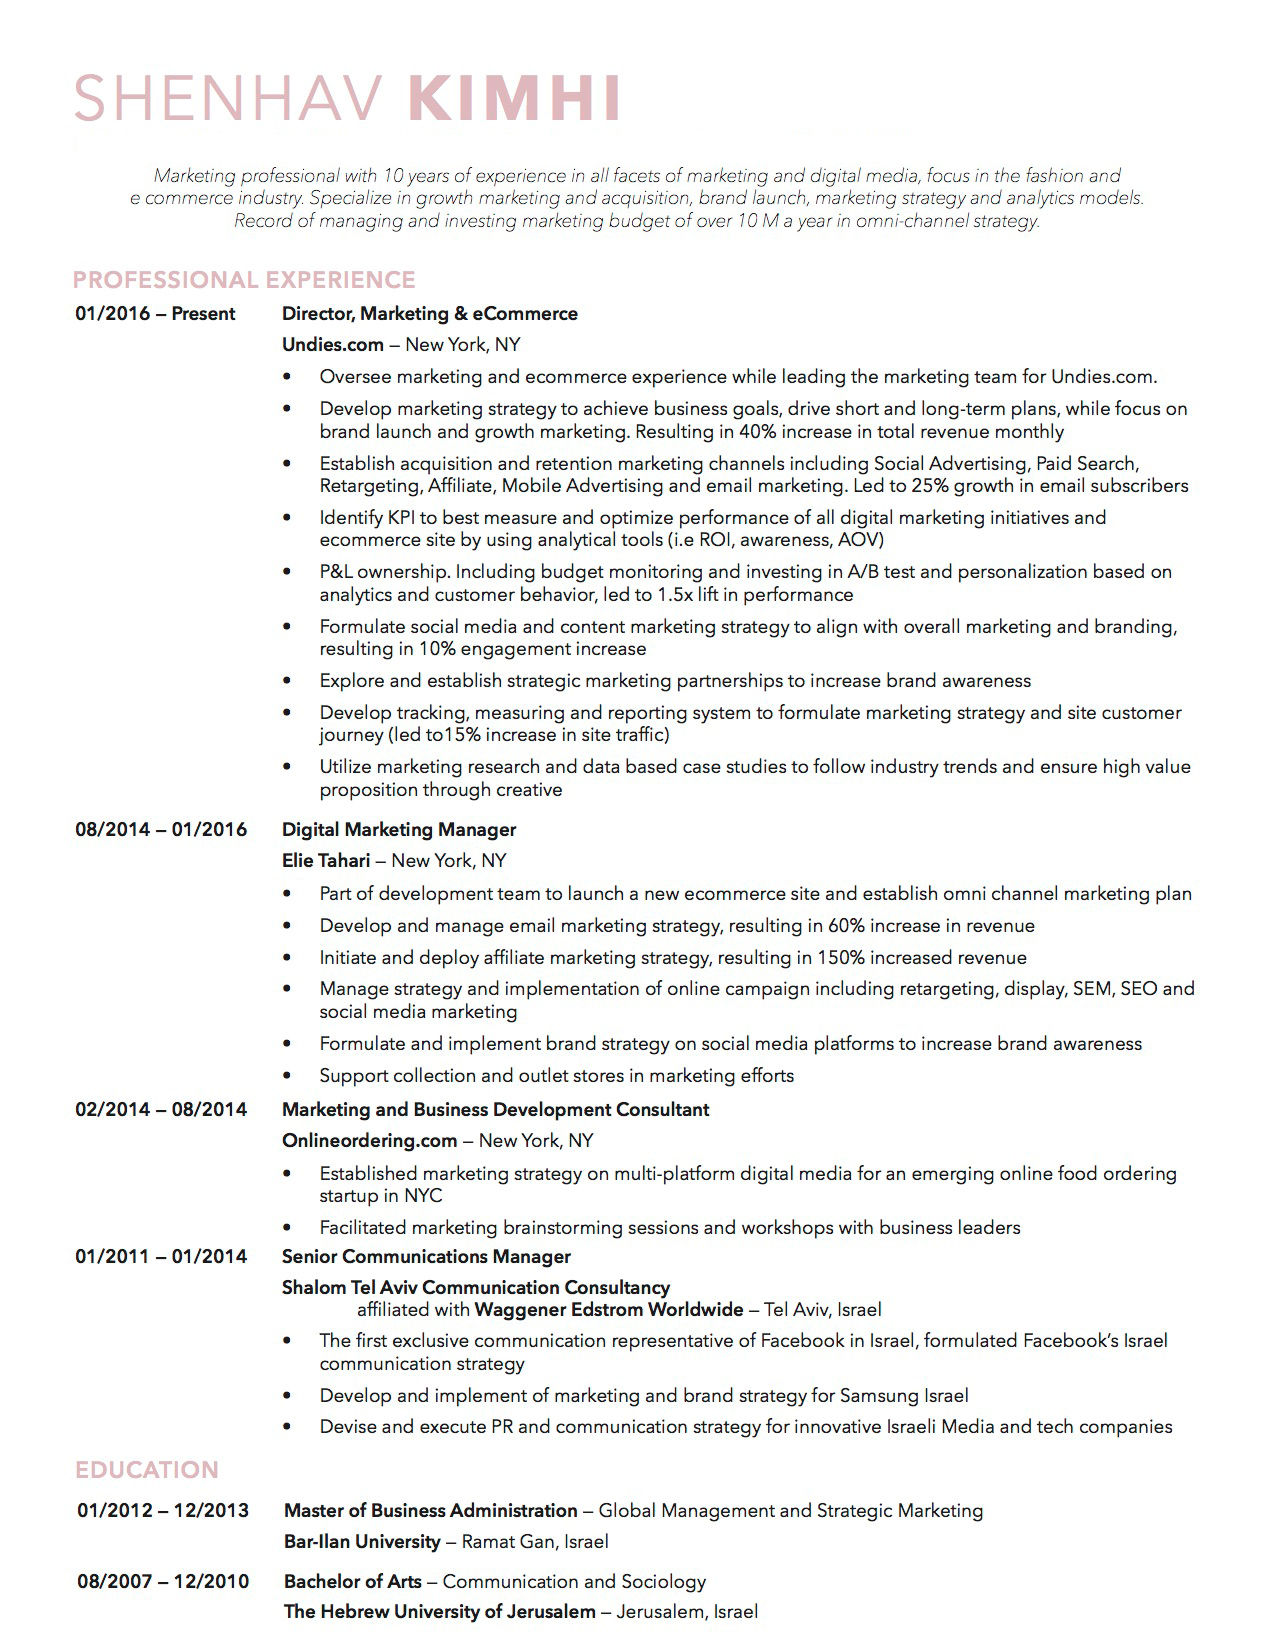 Shenhav-Kimhi-Resume-new+copy.jpg